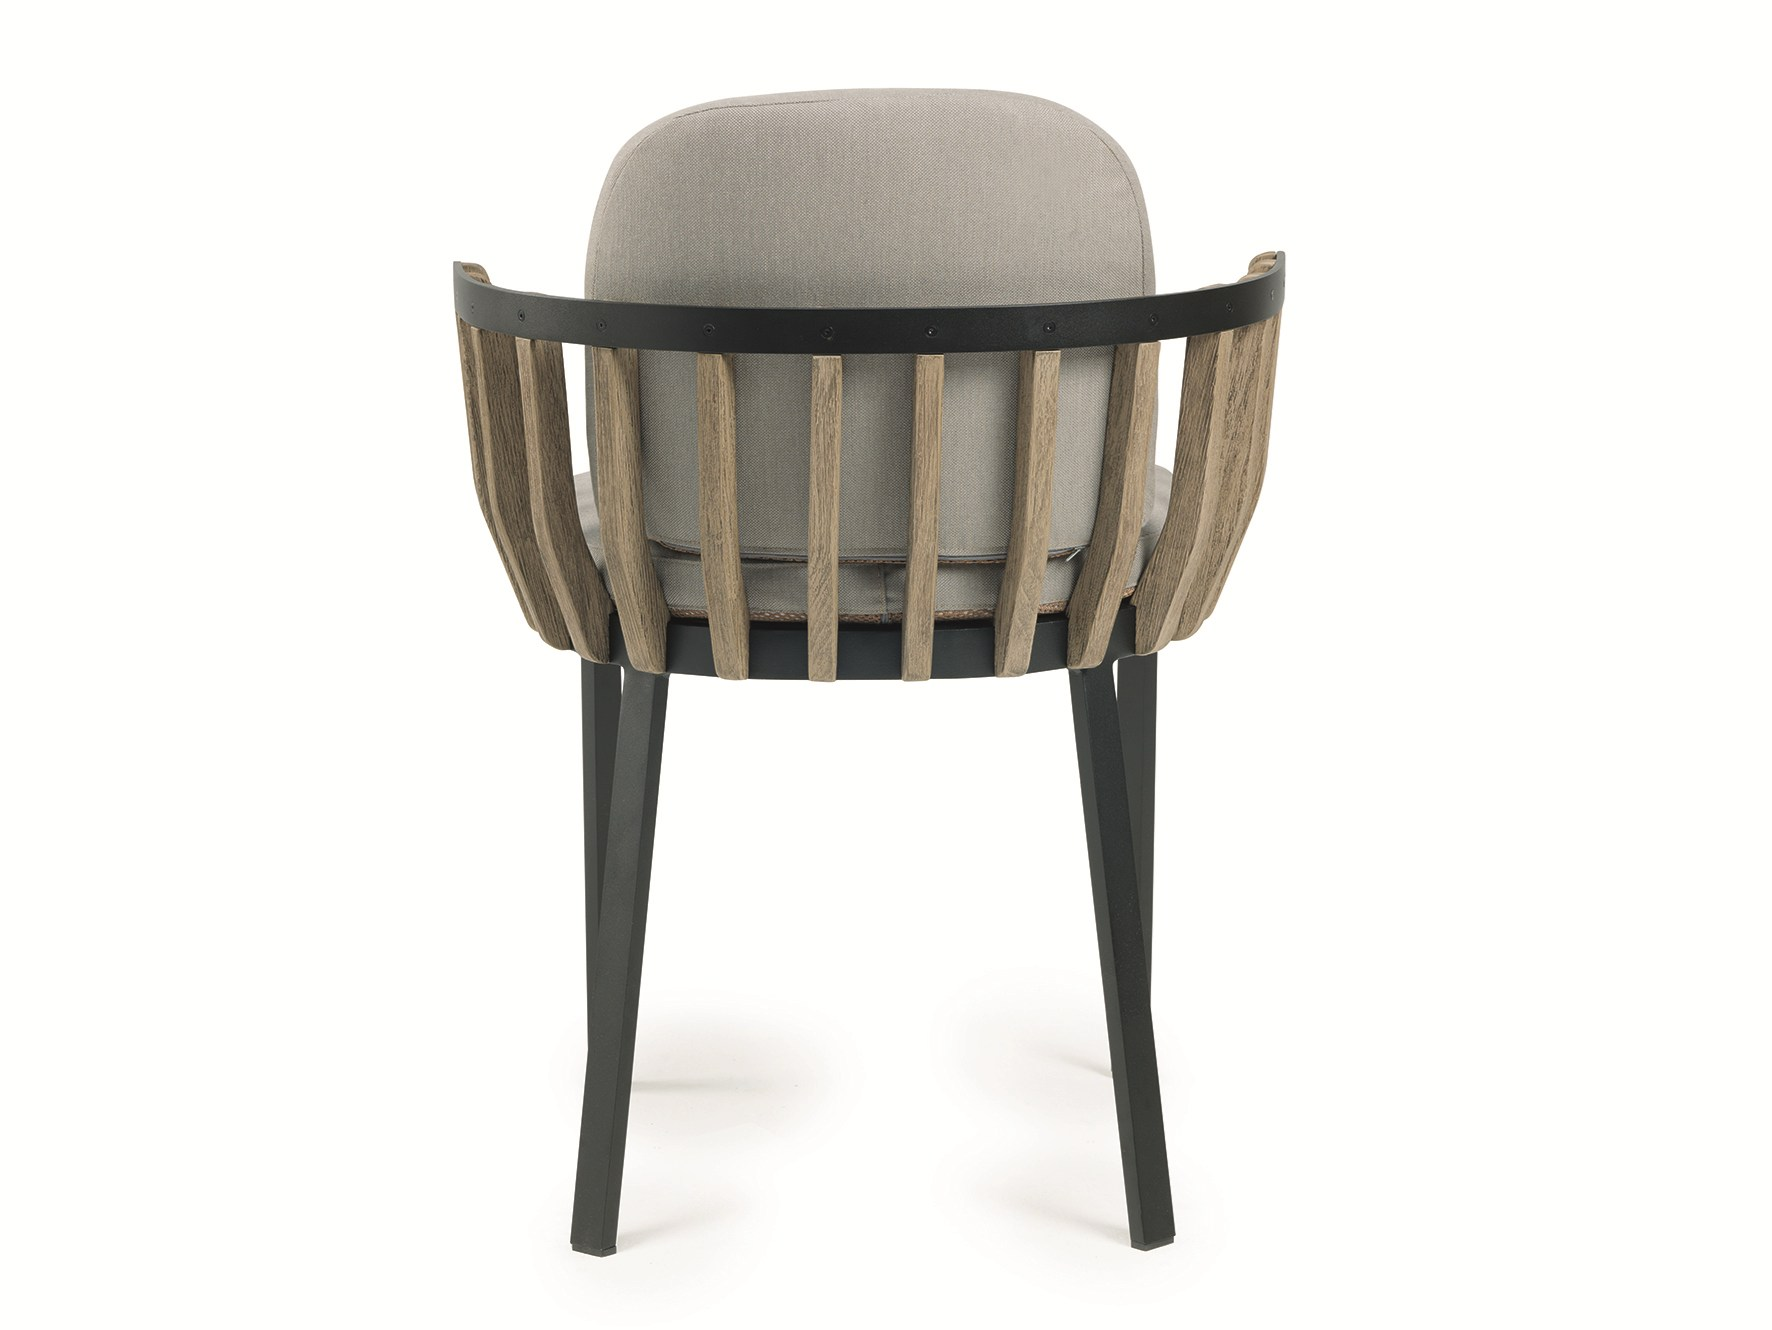 SWING-Garden-chair-Ethimo-283119-rel8560b04a.jpg